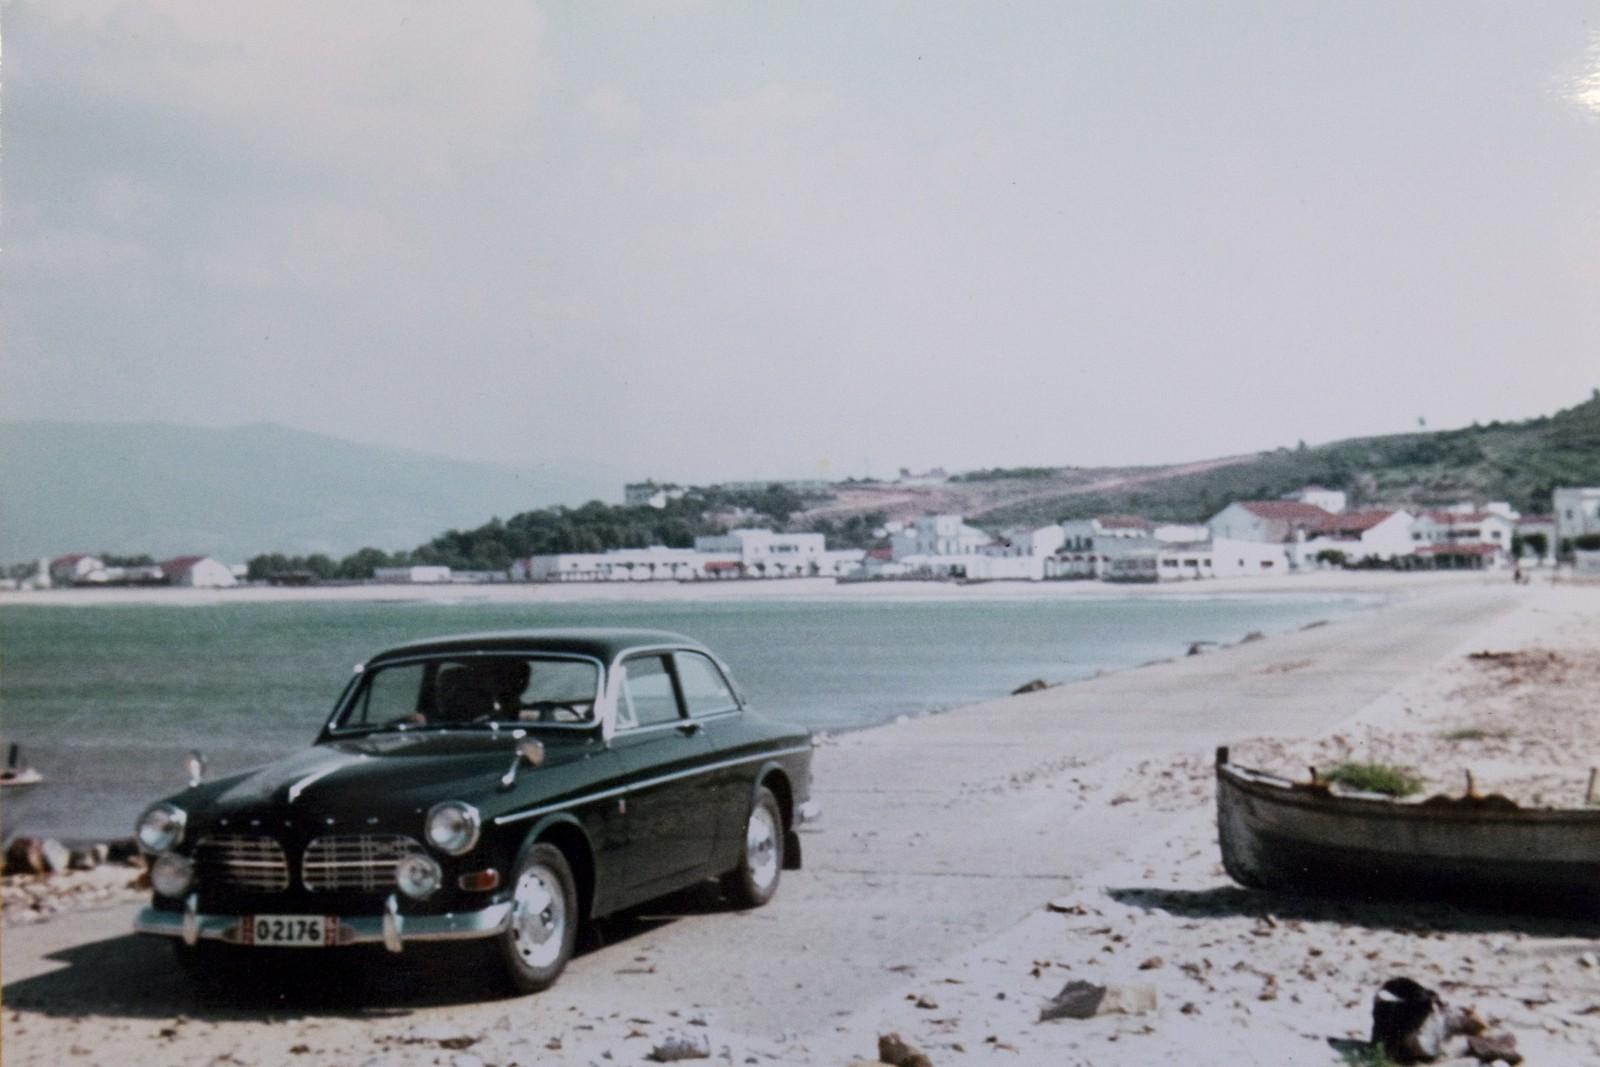 En alldeles ny Volvo Amazon 123 GT med exportskyltar. I bakgrunden syns Afrikas nordligaste punkt.